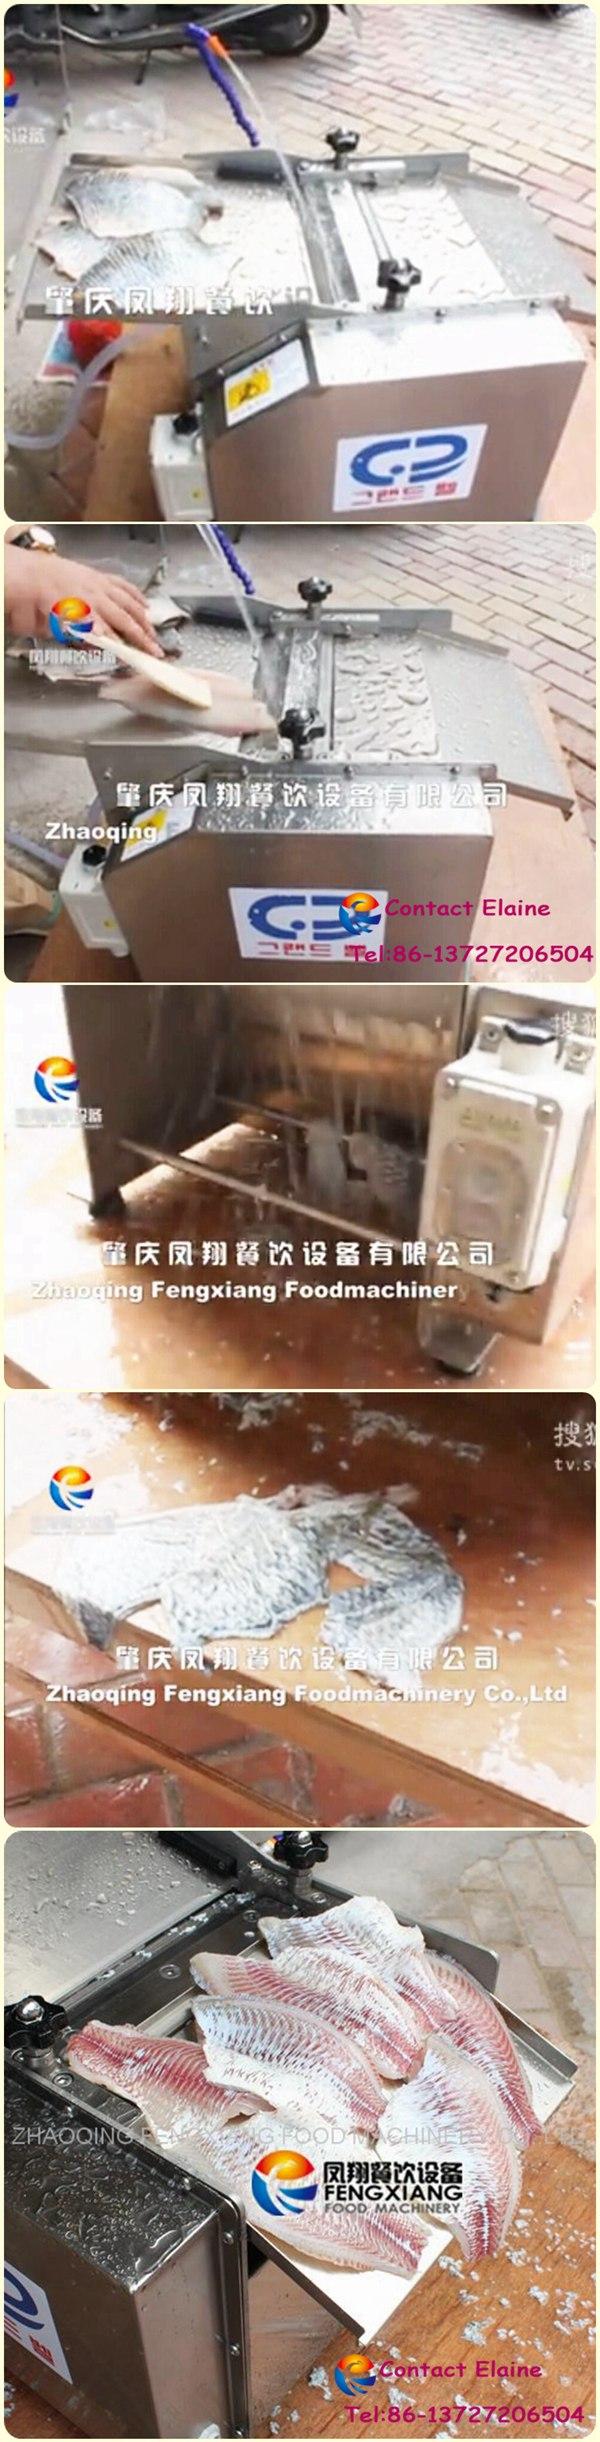 Automatic Fish Skin Peeler Remover Skinning Removing Peeling Processing Machine